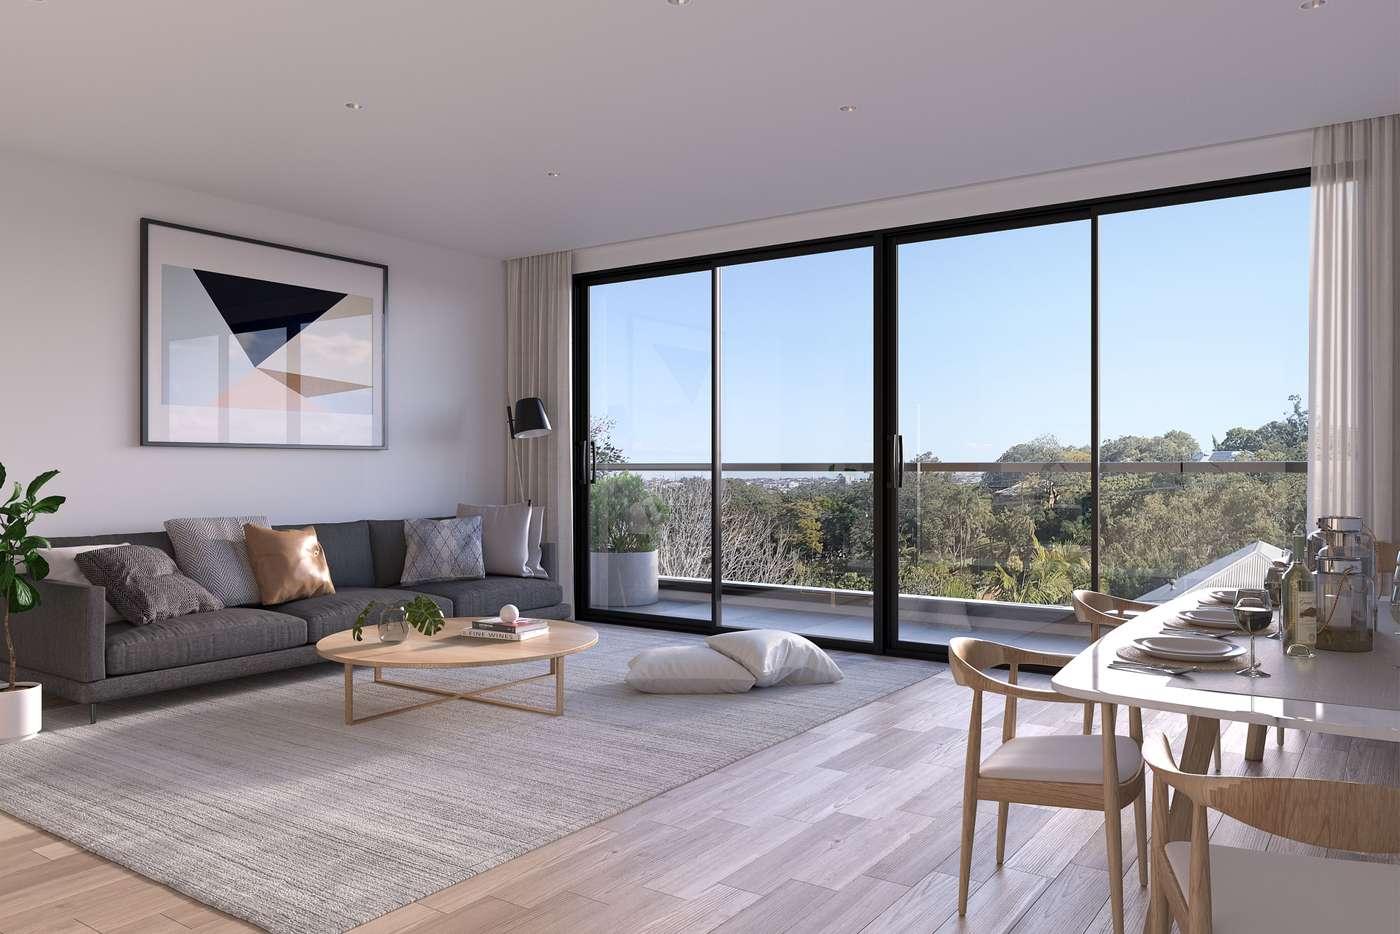 Main view of Homely apartment listing, 1.05 23-25 Clapham Street, Thornbury VIC 3071